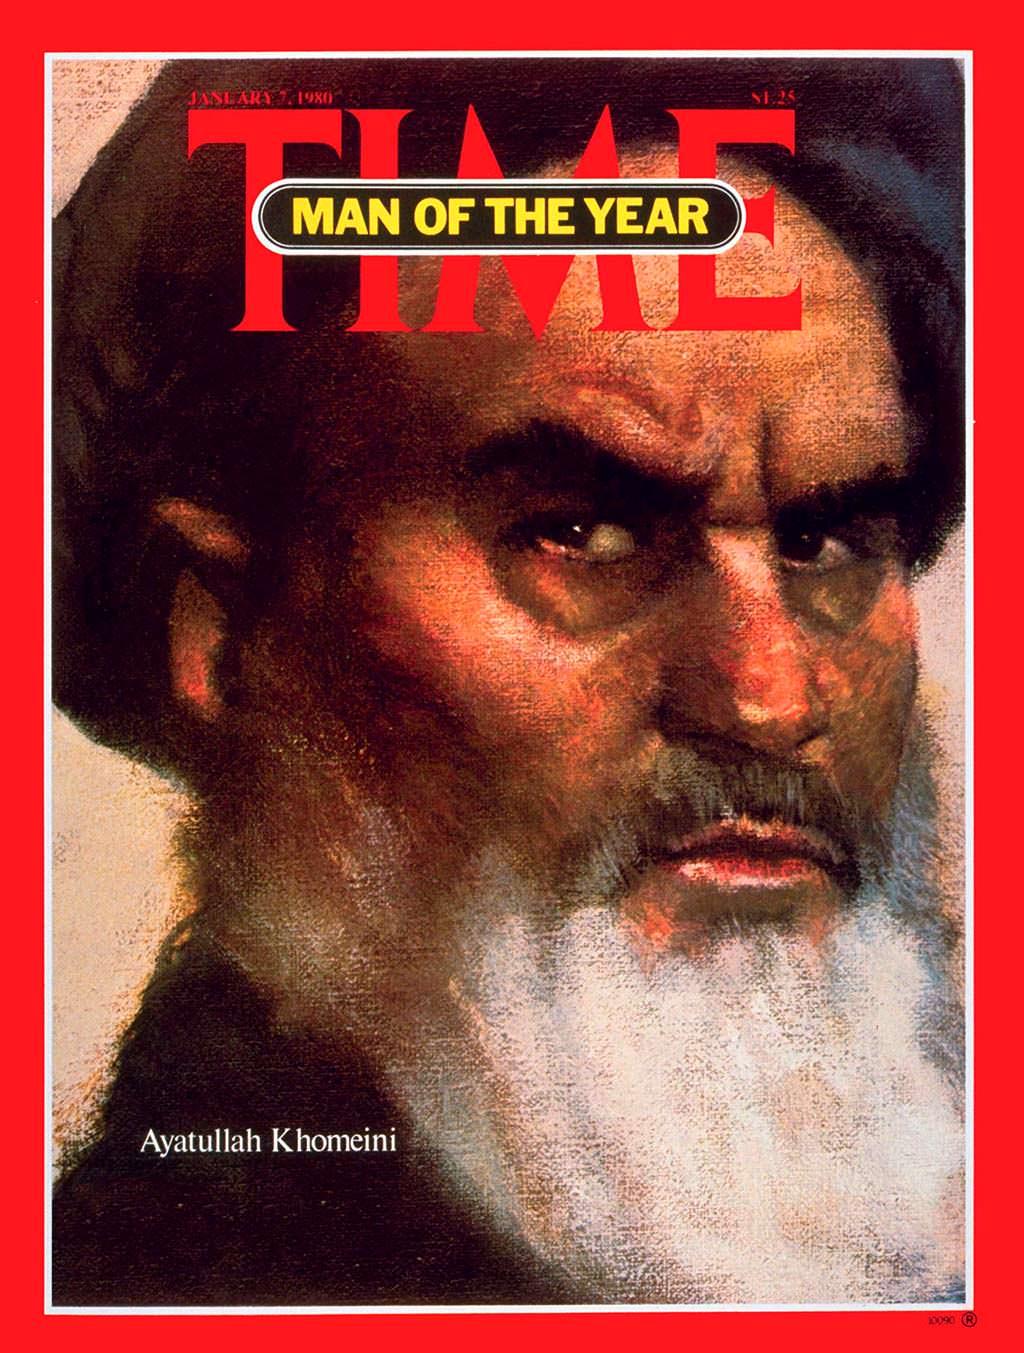 1979 год. Лидер исламской революции Аятолла Хомейни на обложке Time